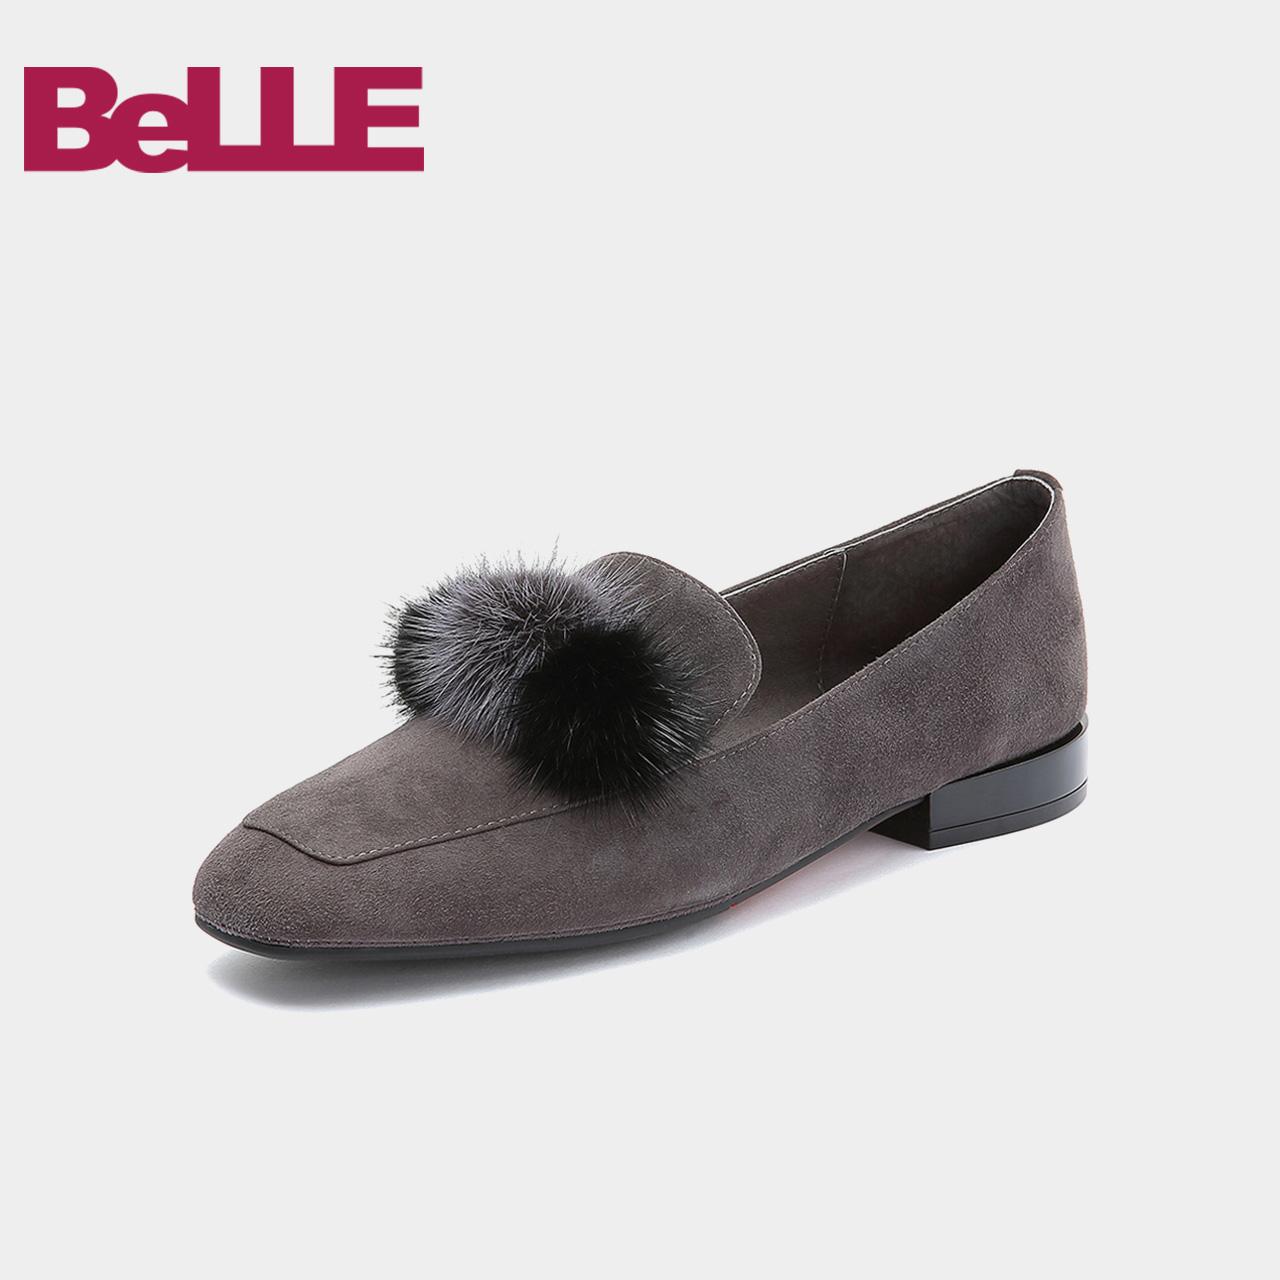 Belle-百丽乐福鞋女2018秋商场同款羊绒皮毛球休闲鞋S9F1DCM8